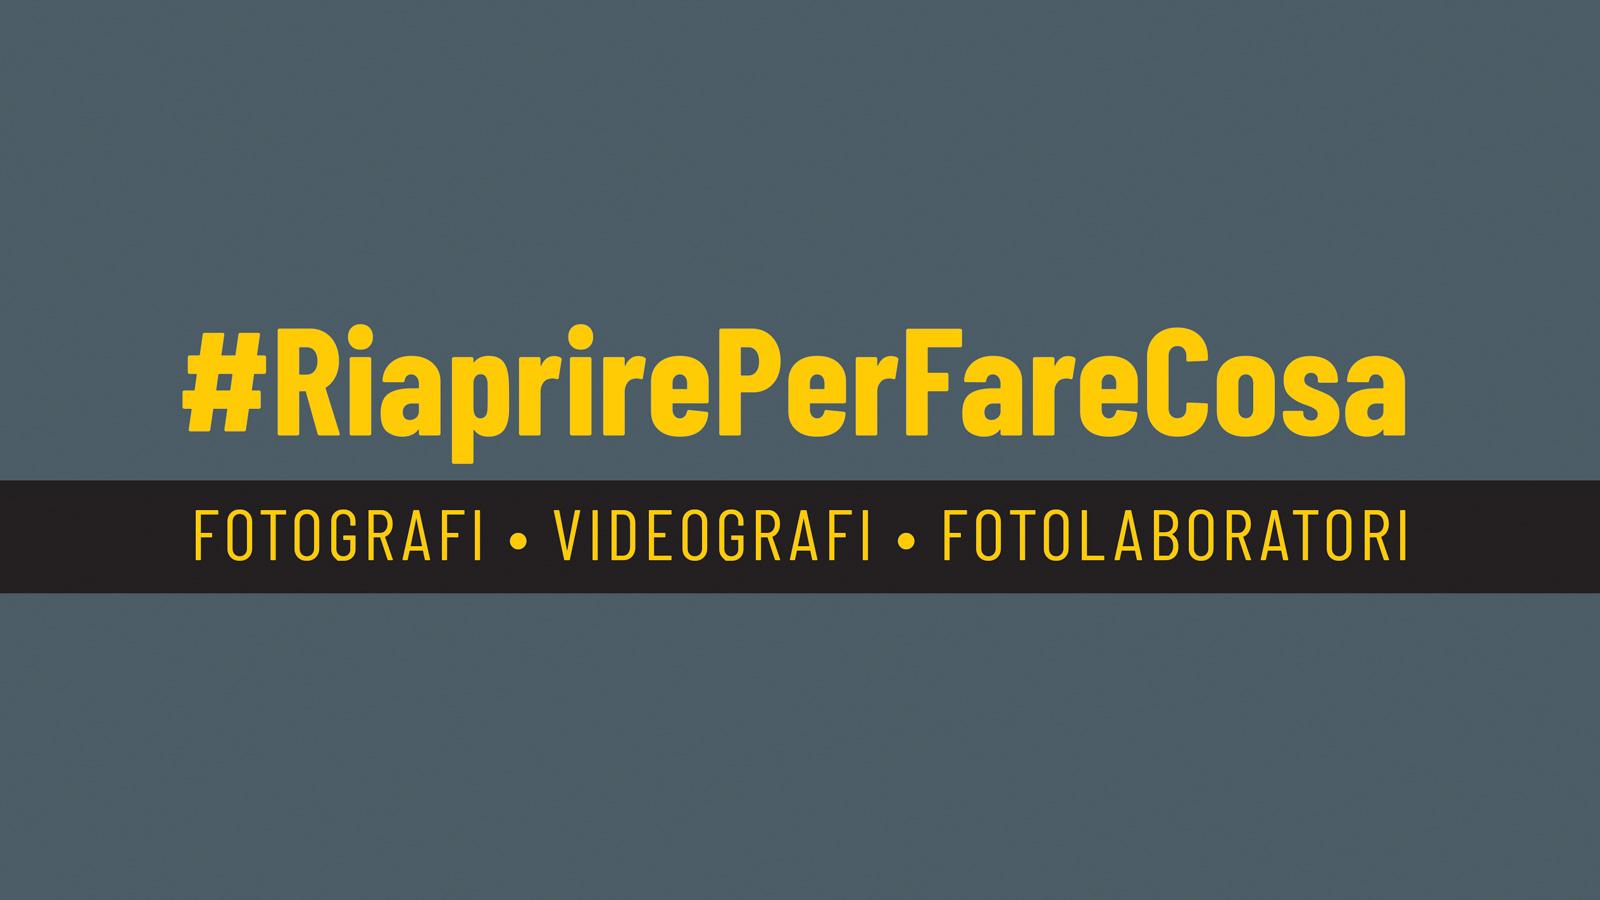 Campagna #RiaprirePerFareCosa